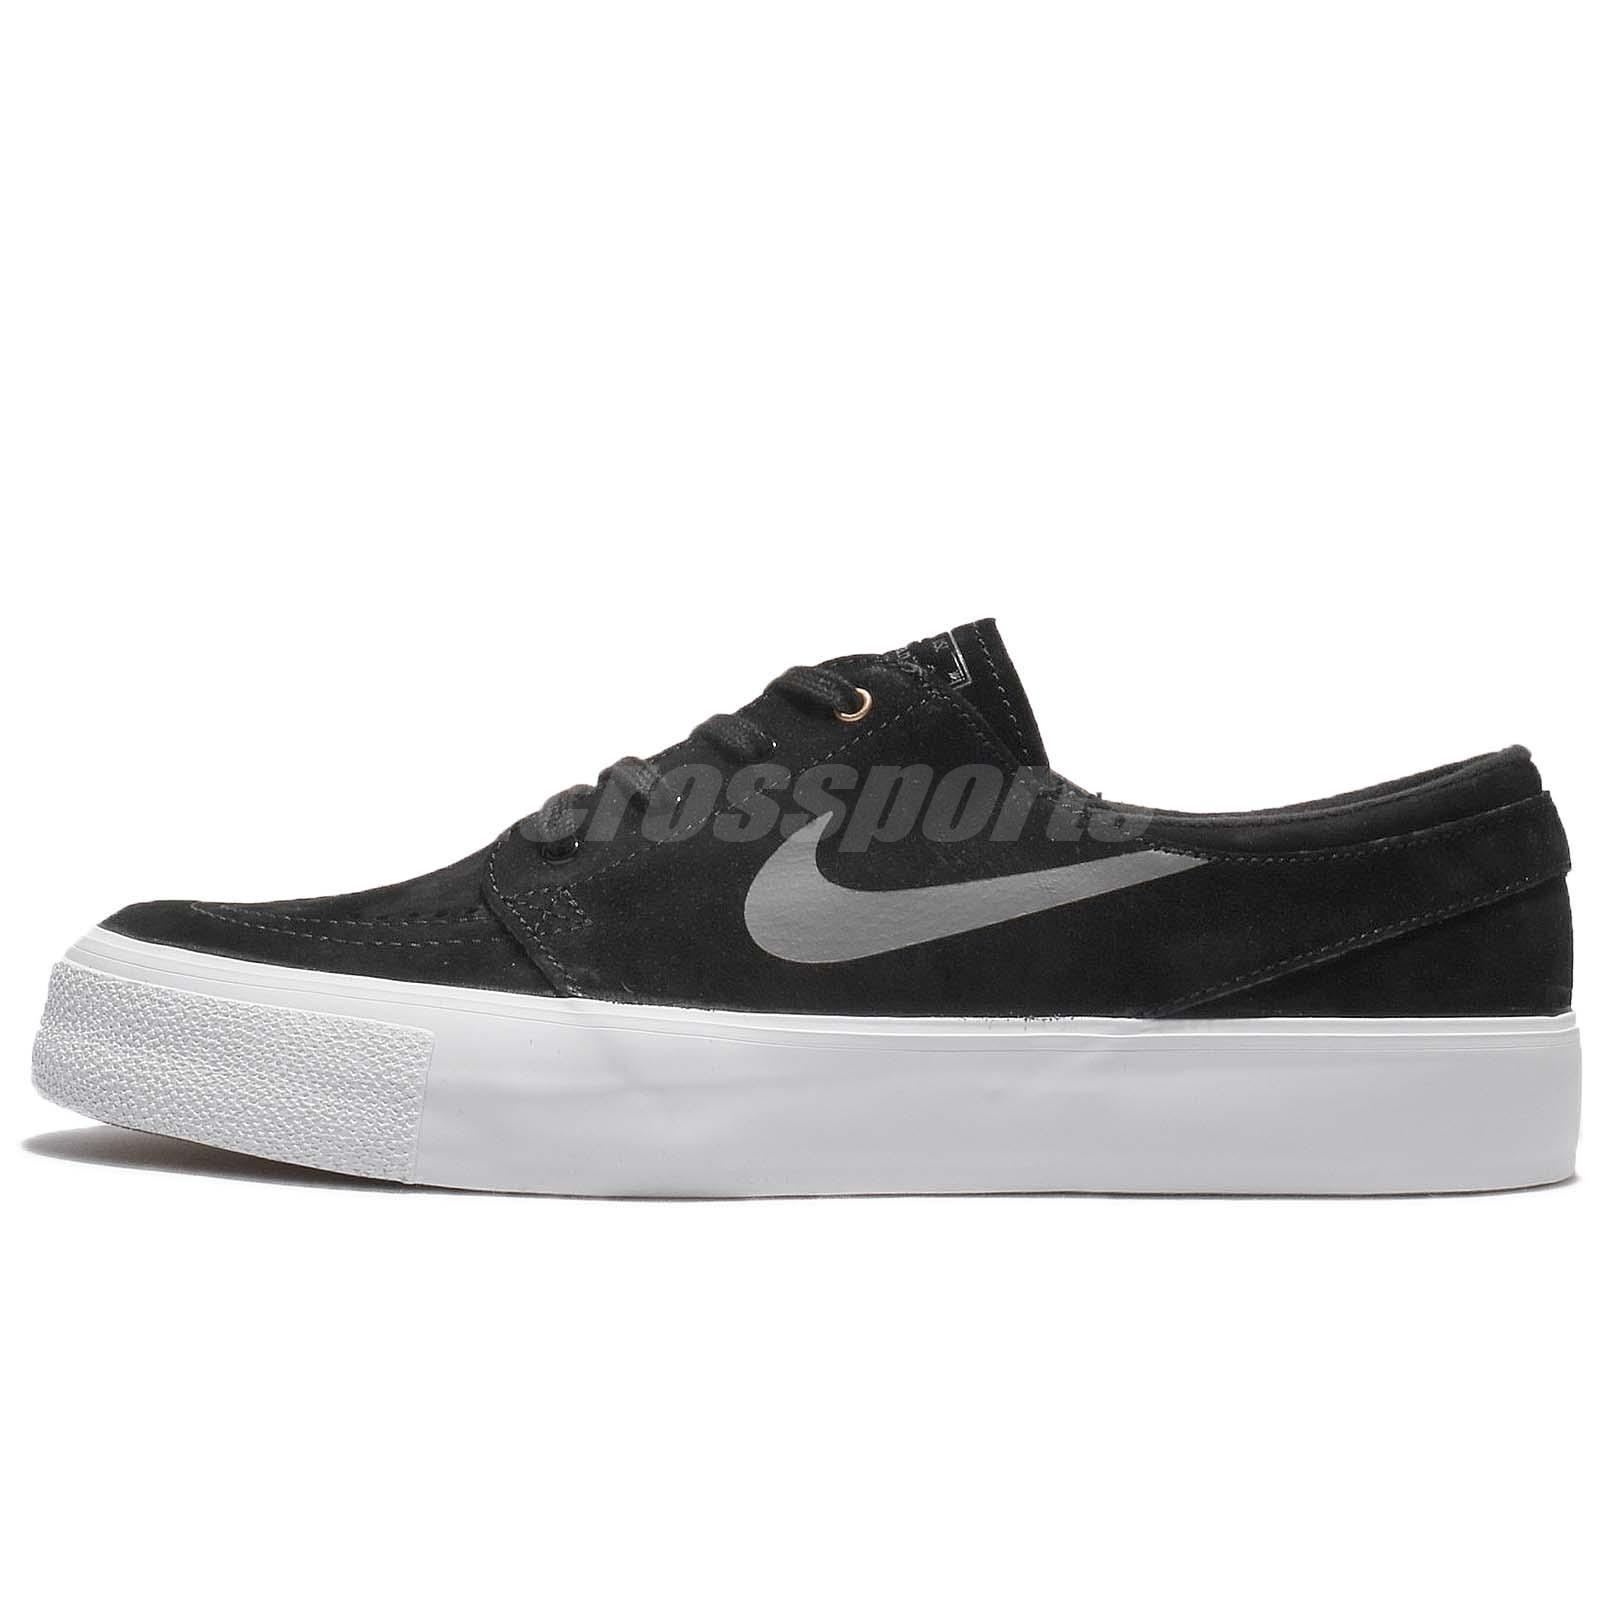 260c1c02848f Nike SB Zoom Janoski HT Premium High Tape Black Men Skateboarding 854321-007